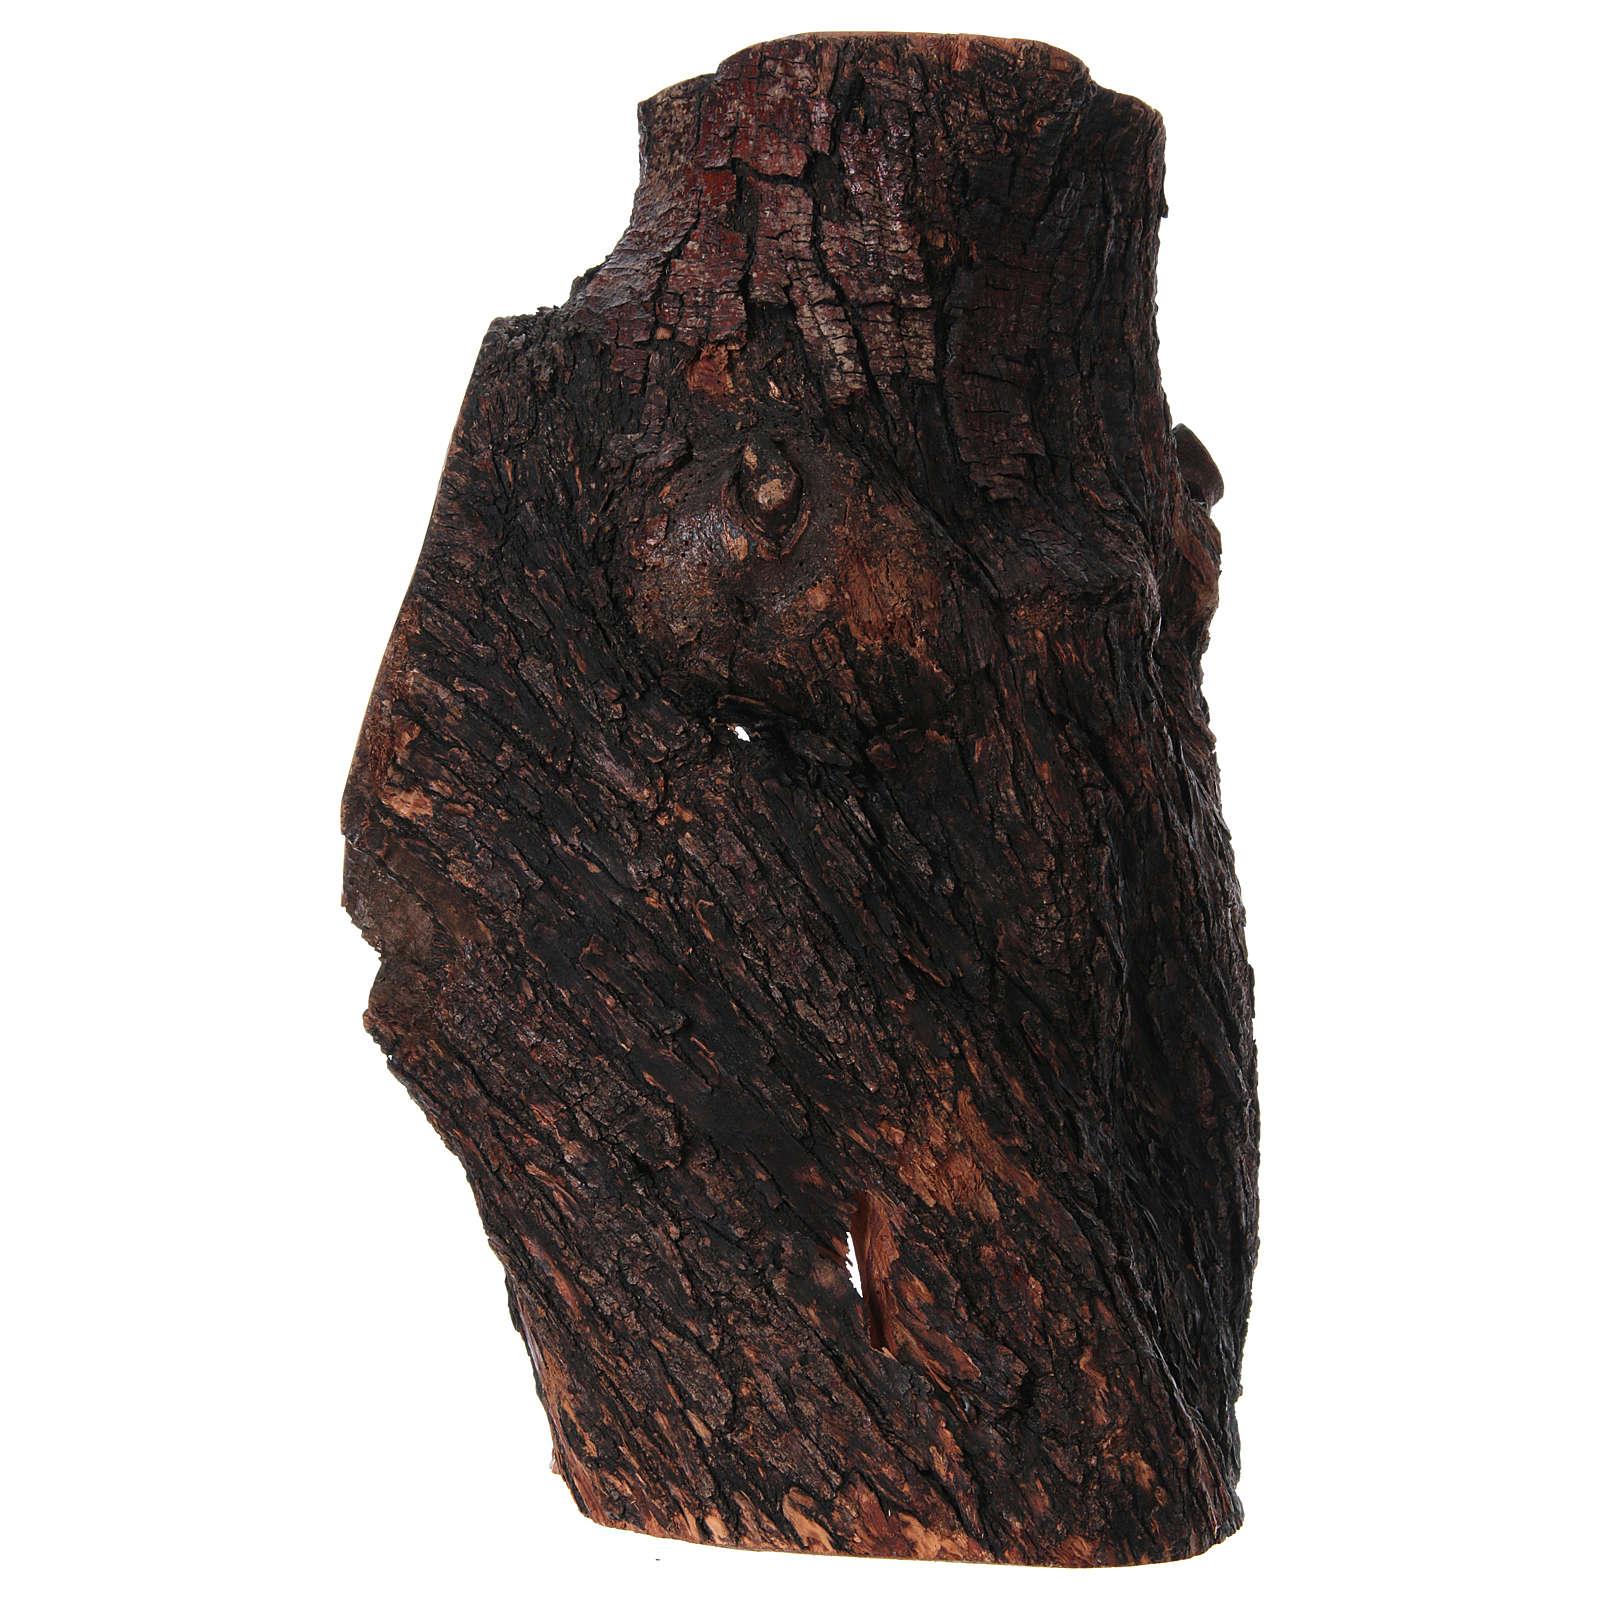 Belén completo olivo de Belén 21 cm en cueva natural 45x30x30 cm 4